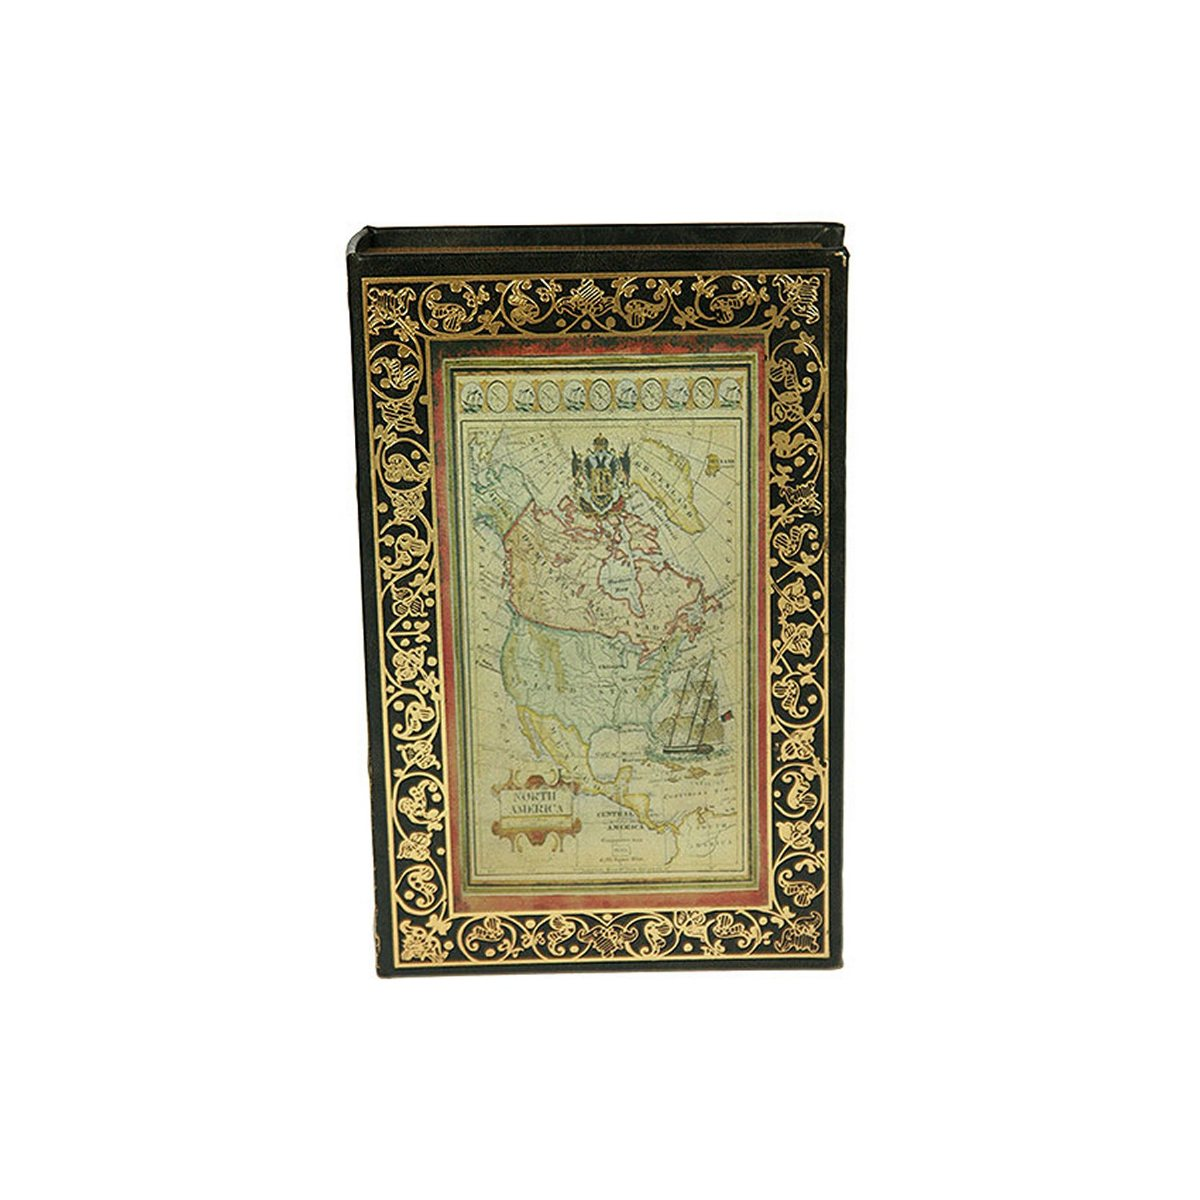 Шкатулка-фолиант Win Max Старинная карта, 26 х 17 х 5 см. 184239 шкатулка фолиант париж 21 14 3см